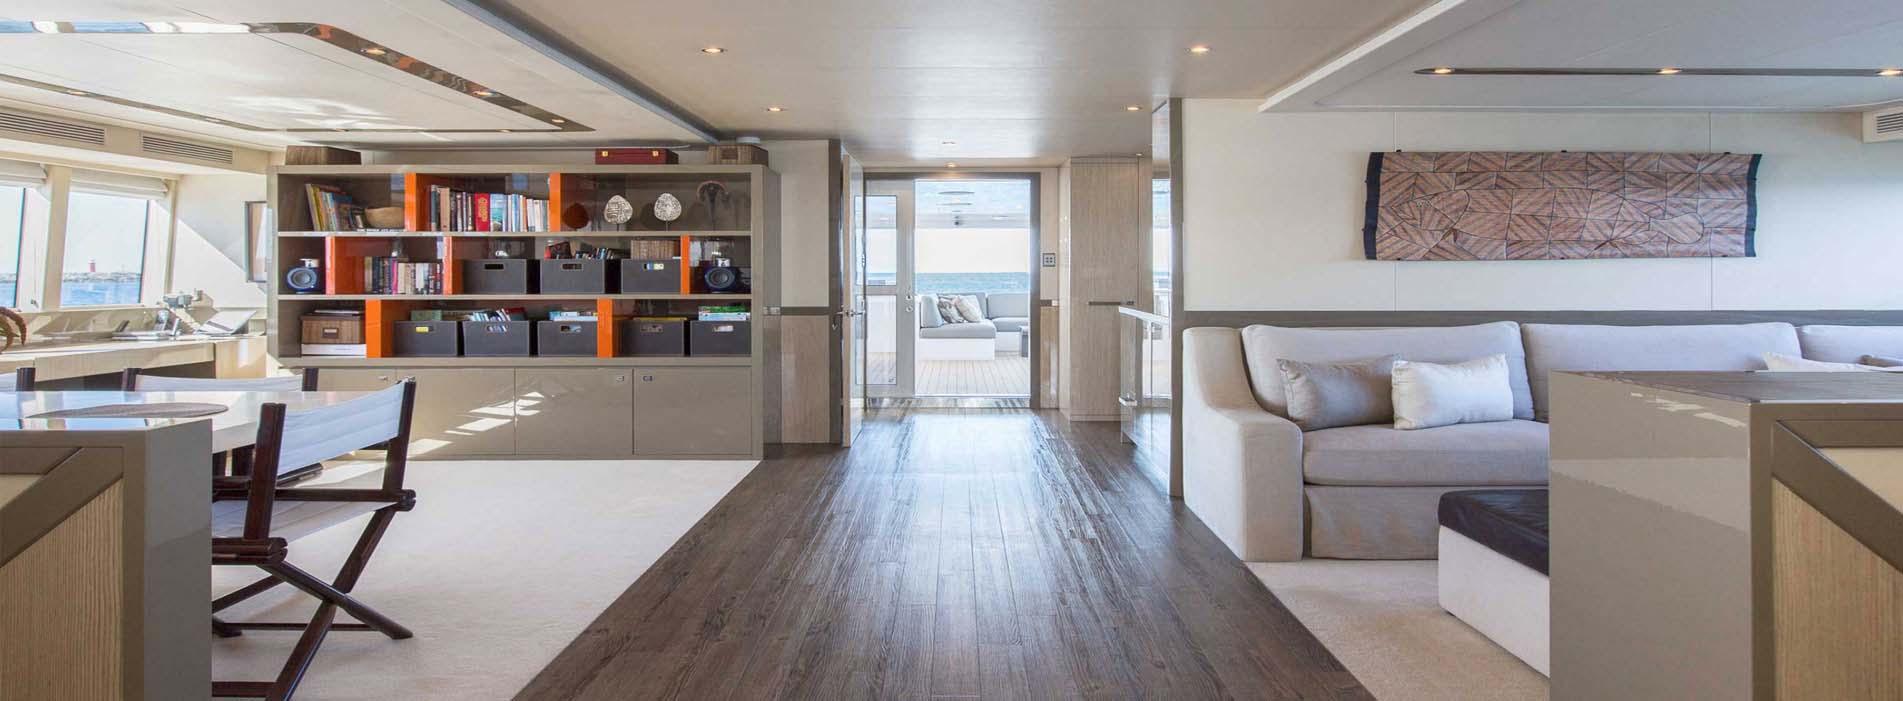 Ocean-Dream-library-lounge-interior-Perth-luxury-boat-chartersOcean-Dream-library-lounge-interior-Perth-luxury-boat-charters